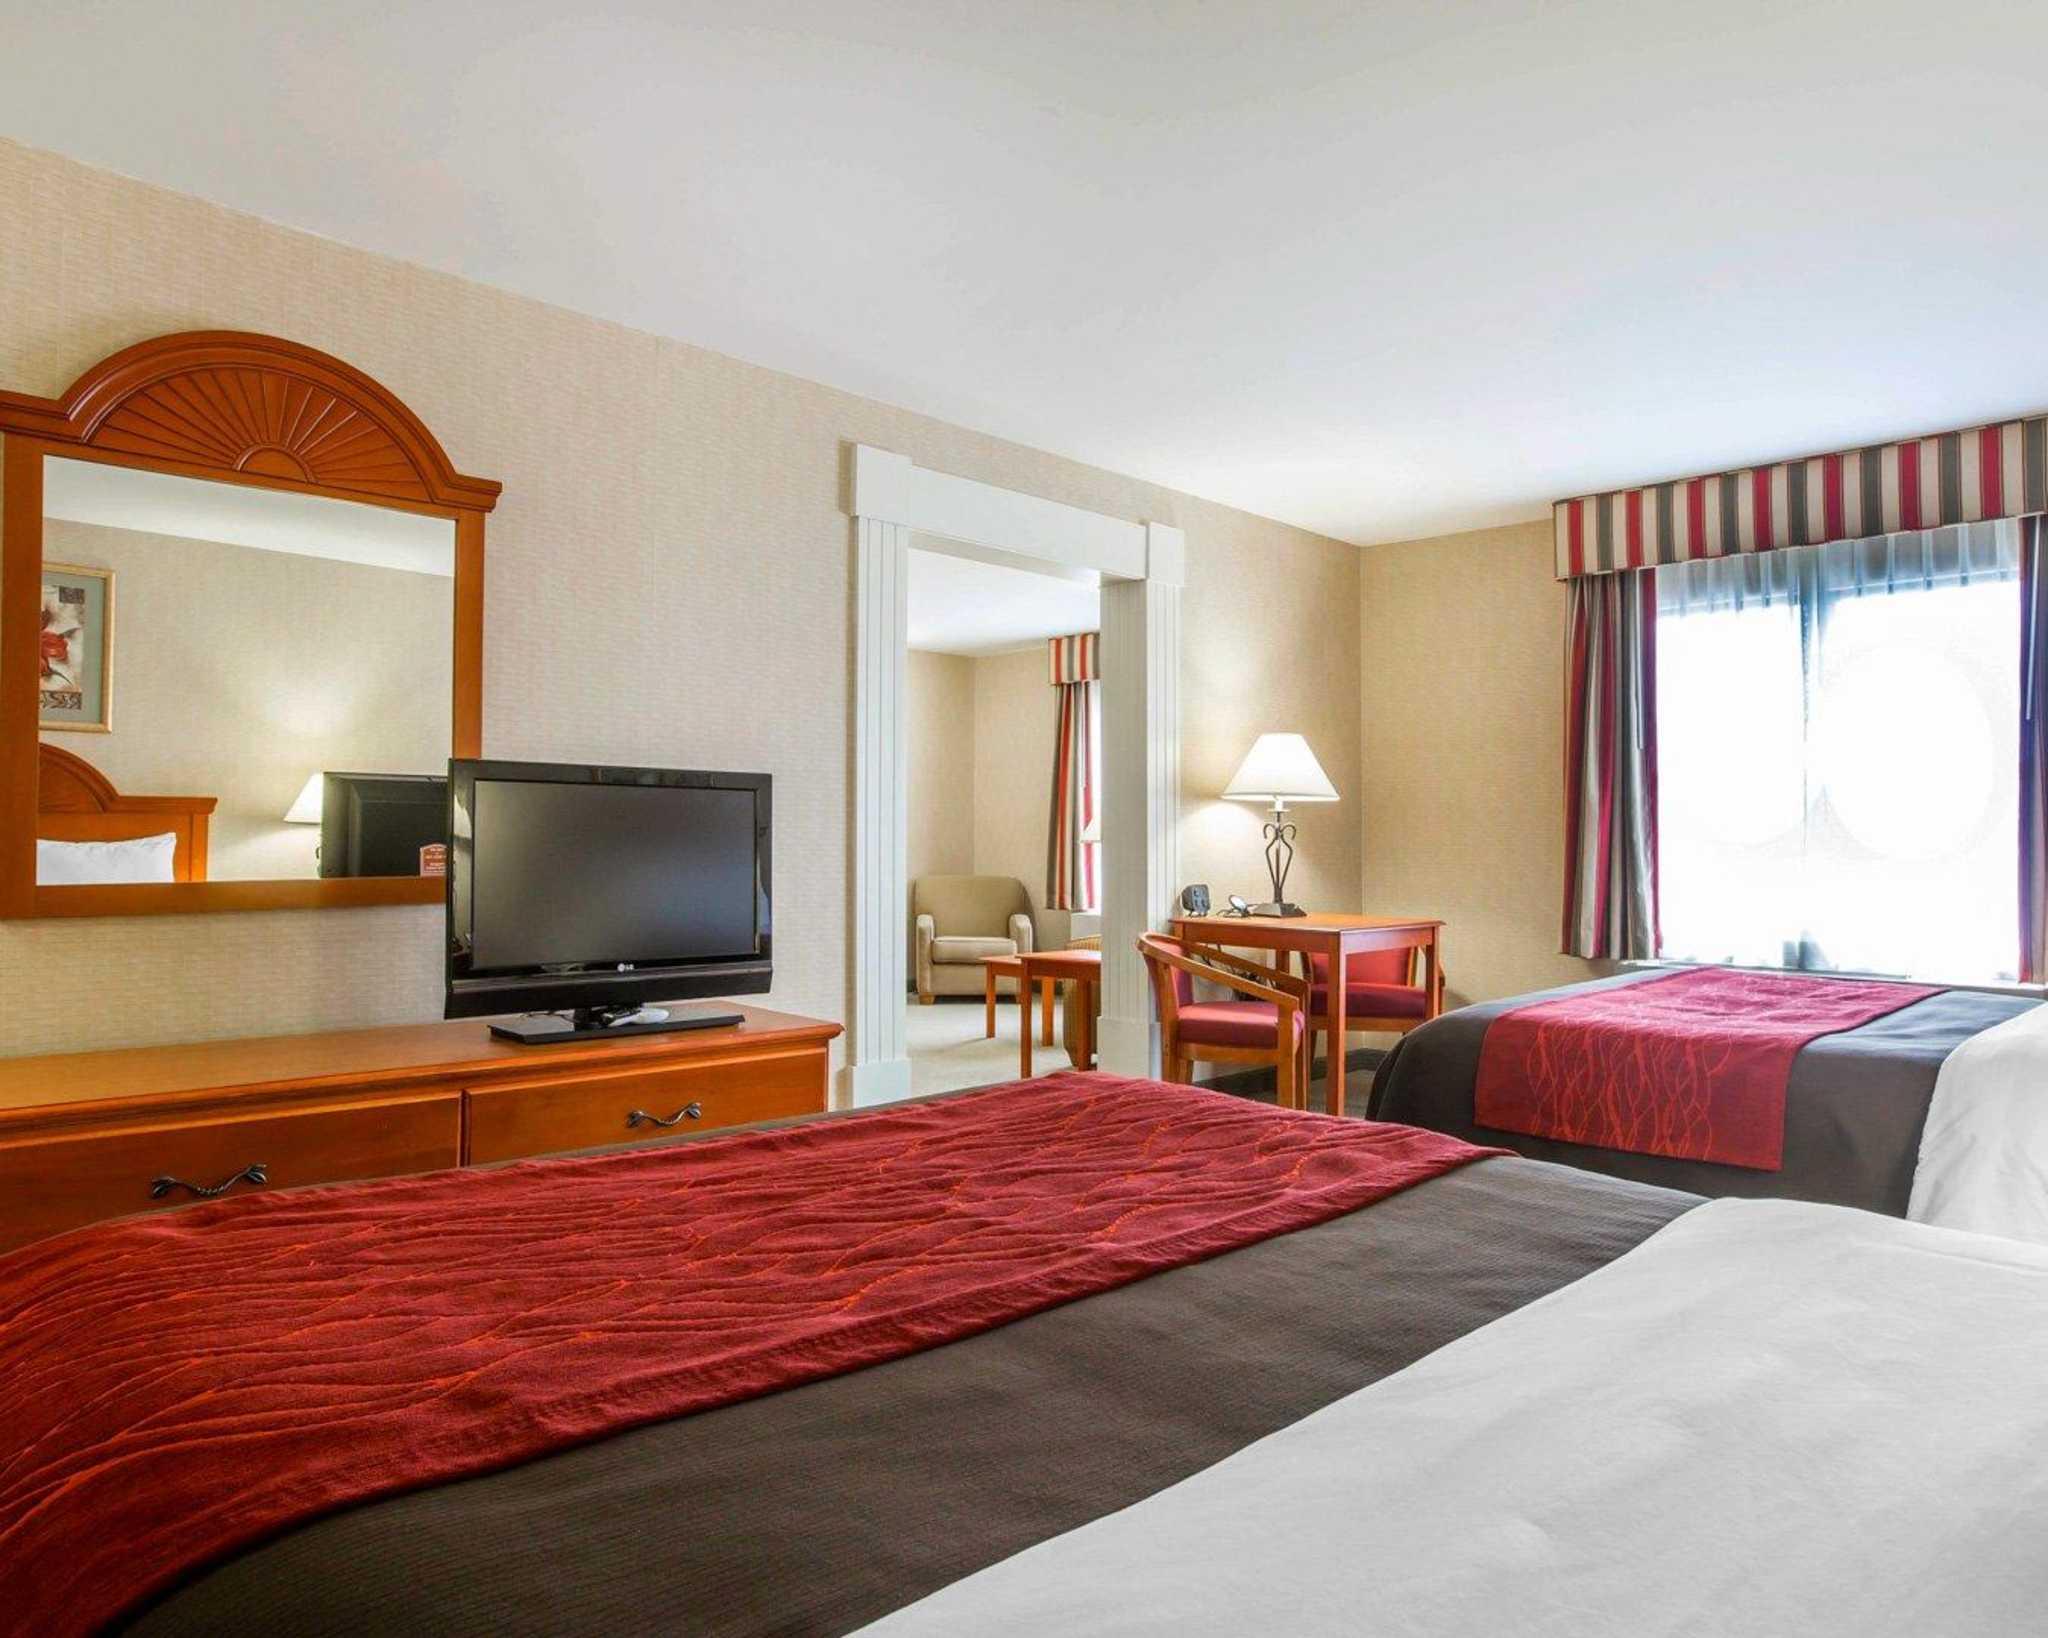 Comfort Inn & Suites adj to Akwesasne Mohawk Casino image 42